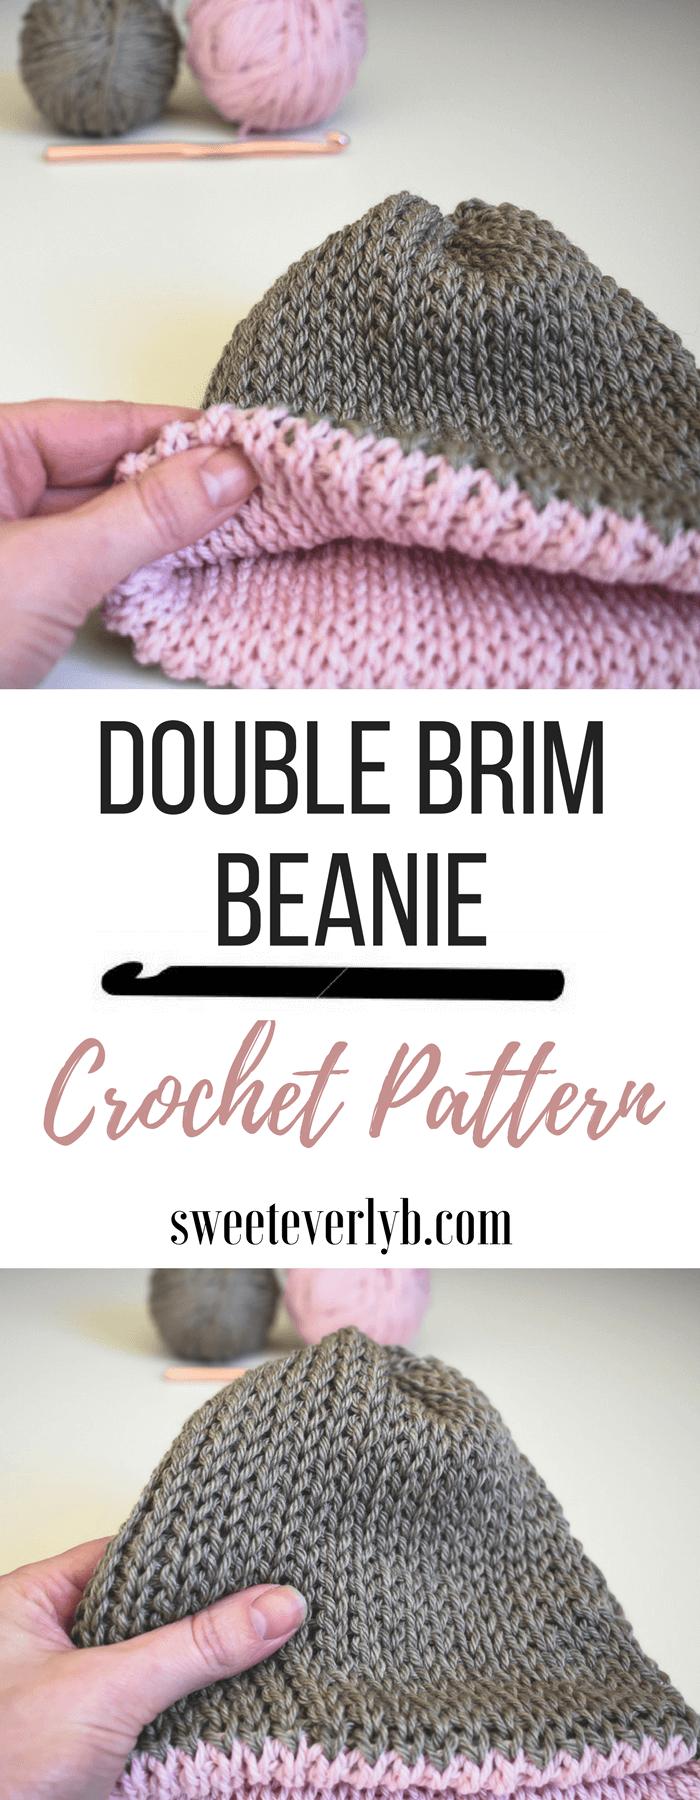 A Free Knit-Look Double Brim Crochet Beanie Pattern  d39e8dfefda